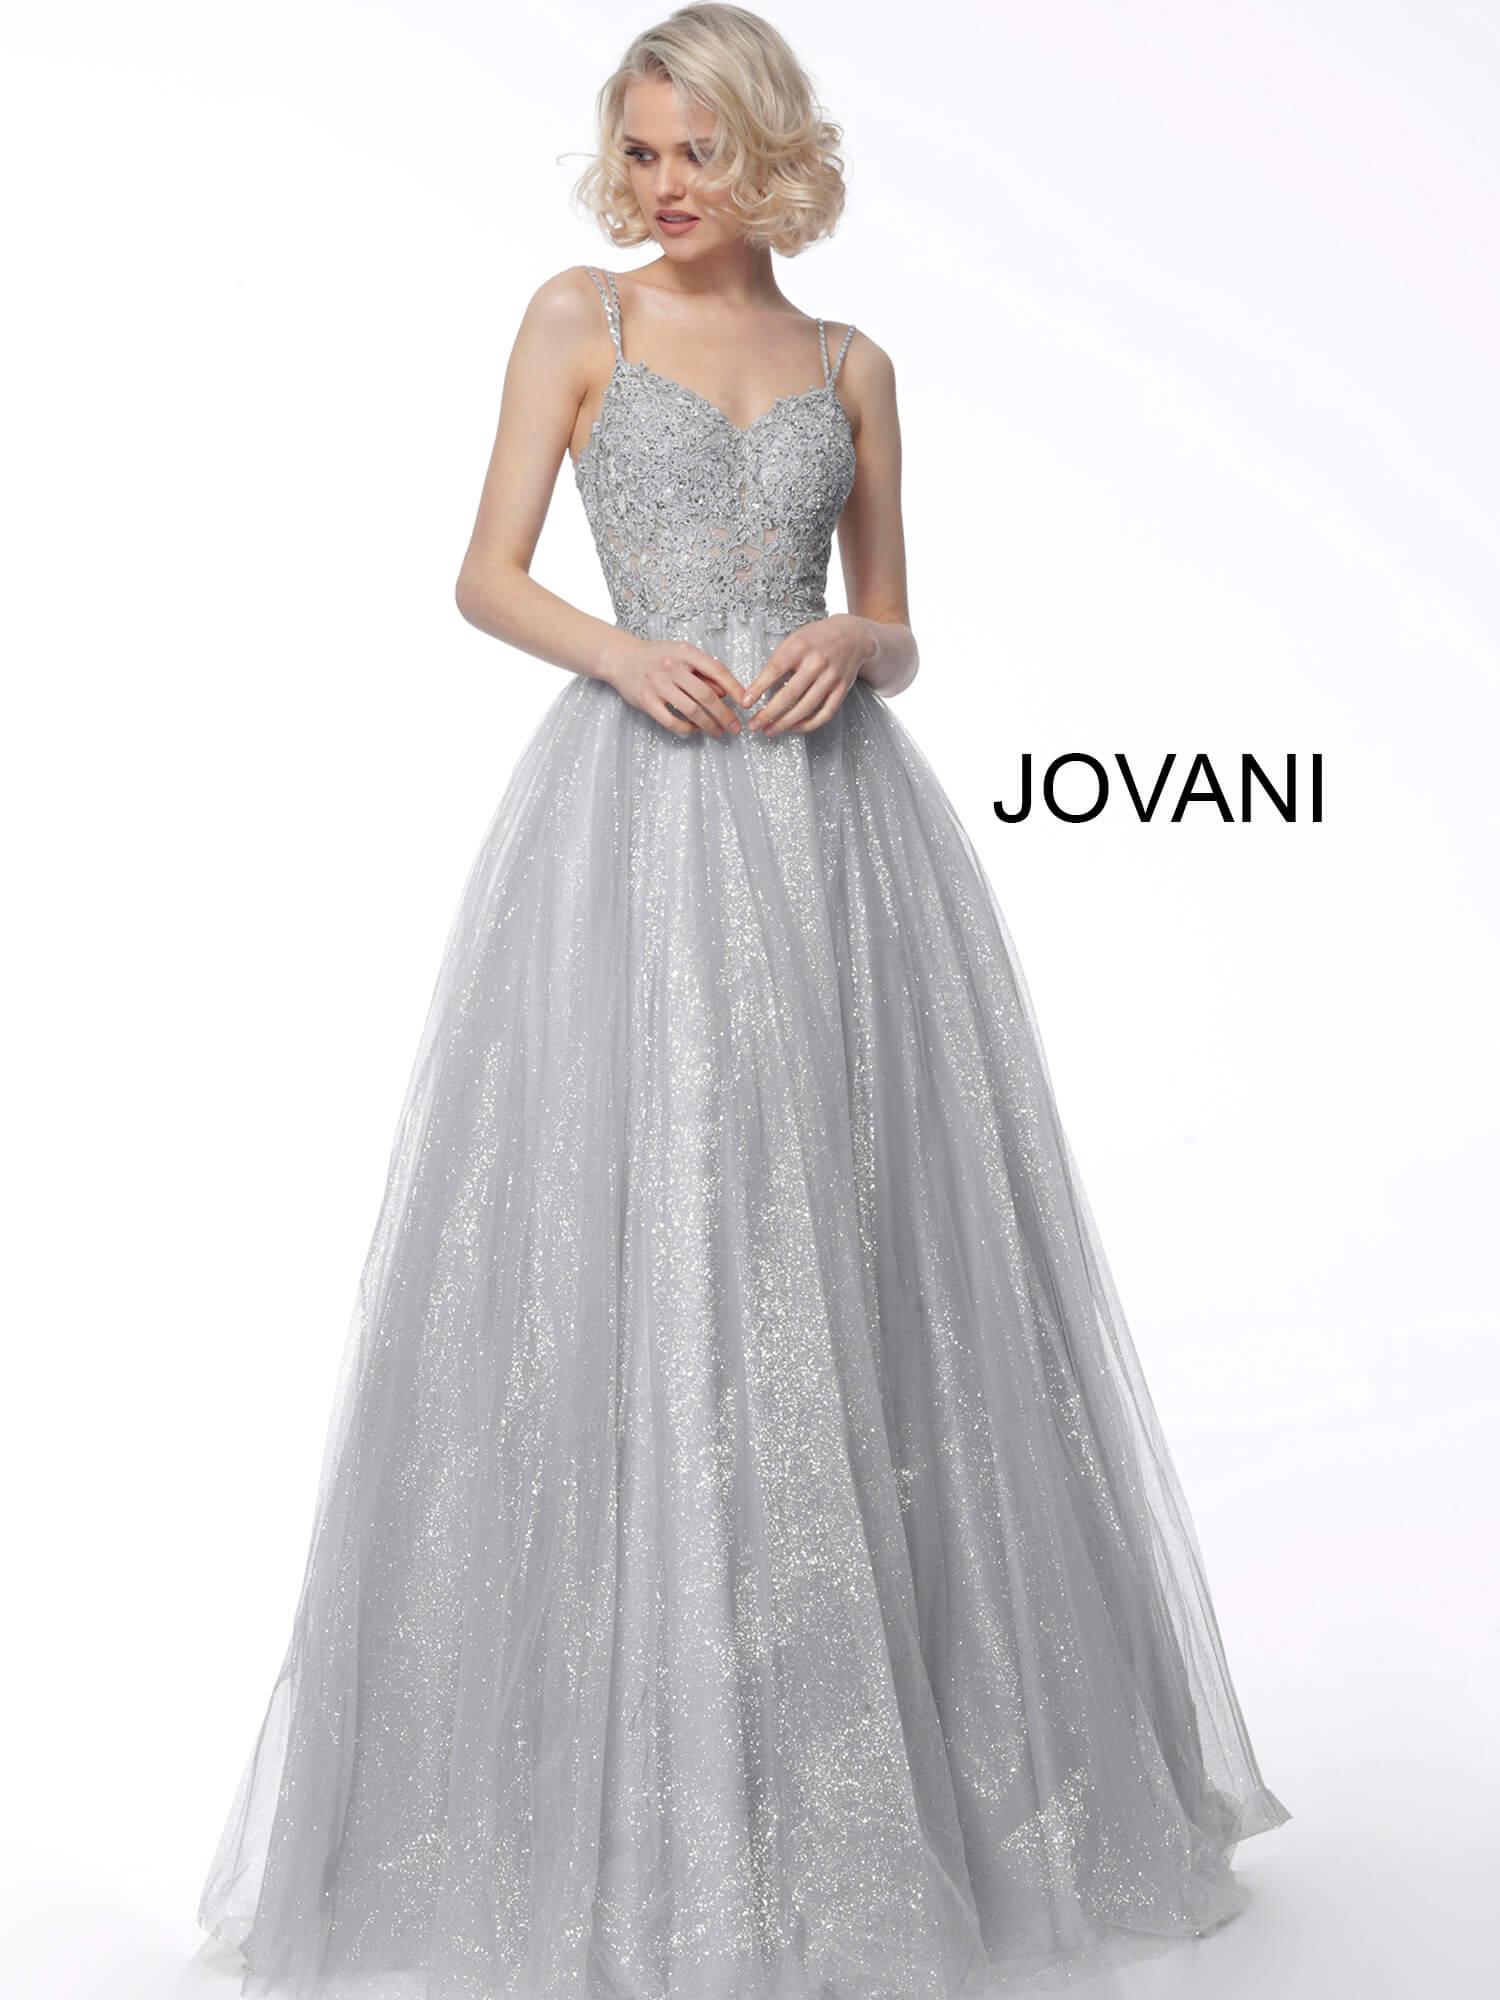 beb192e6928d67 Jovani Silver Ball Gown